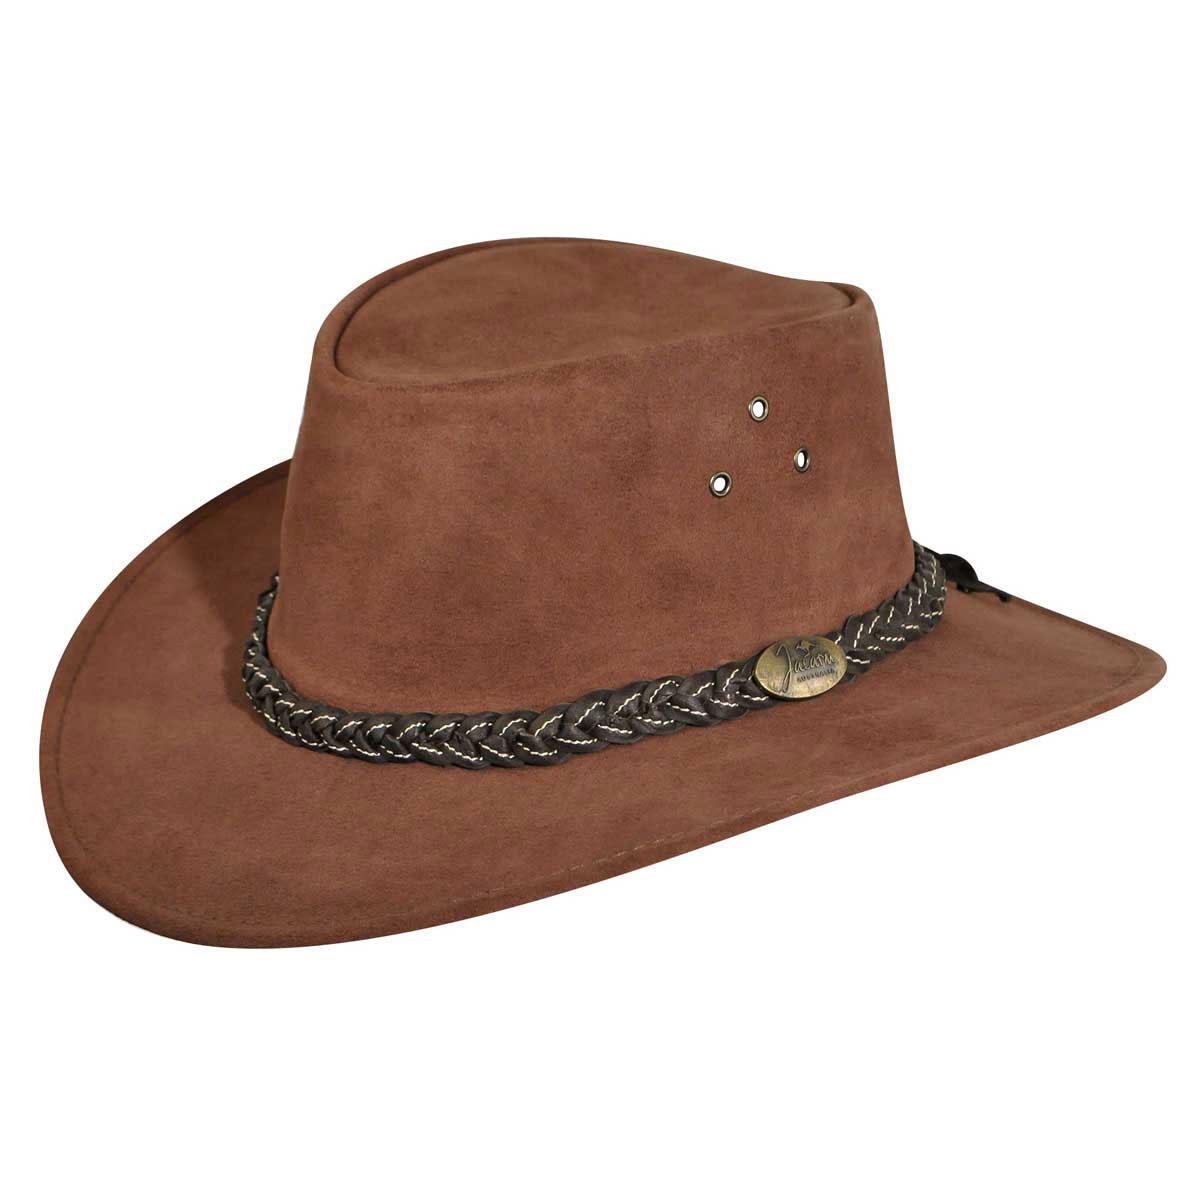 Jacaru Wallaroo Suede Outback Hat in Brown